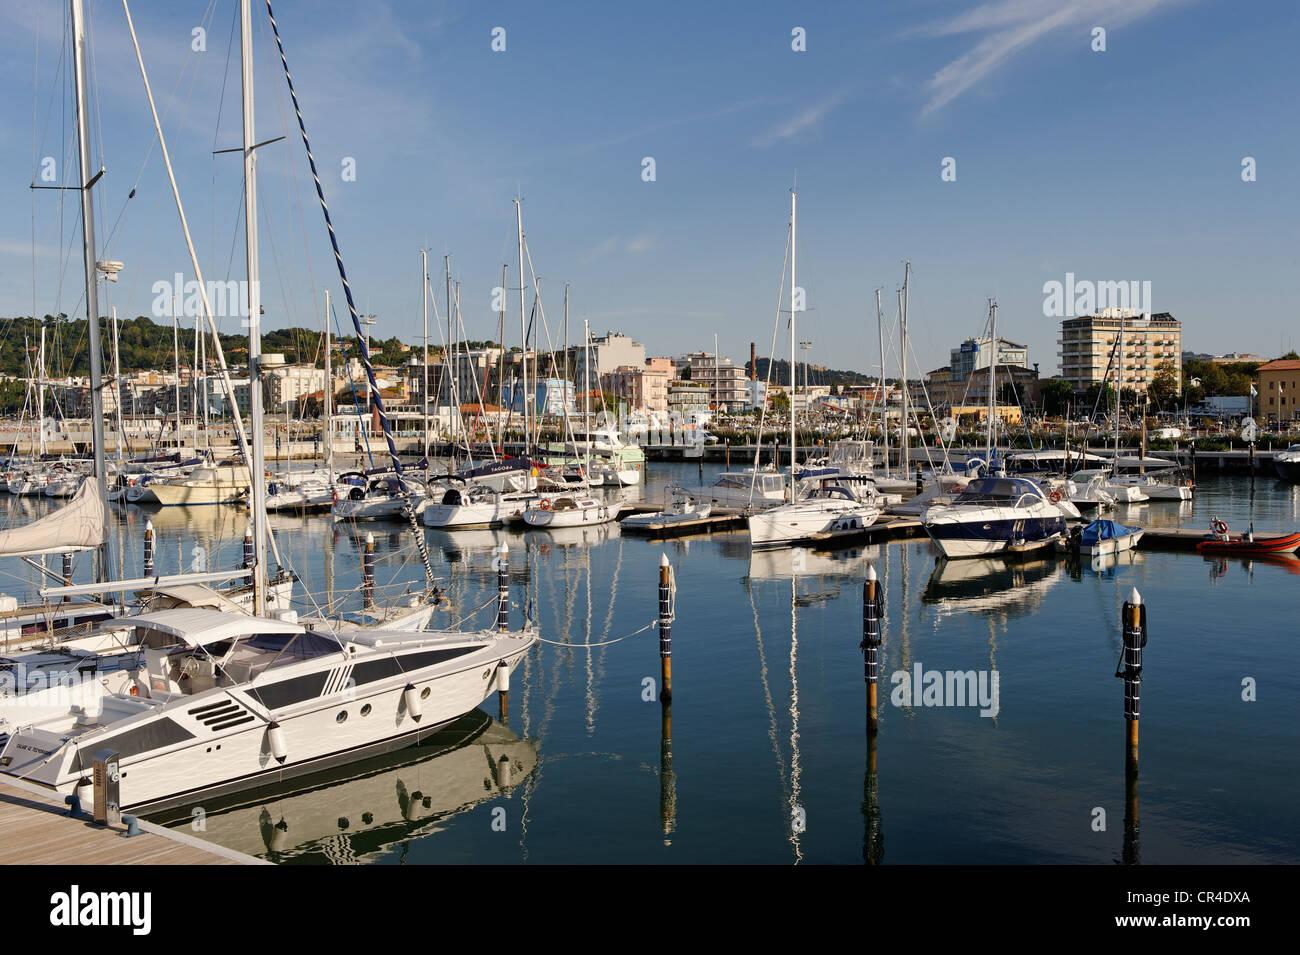 Marina, Cattolica, Province of Rimini, Emilia-Romagna, Adriatic coast, Italy, Europe - Stock Image